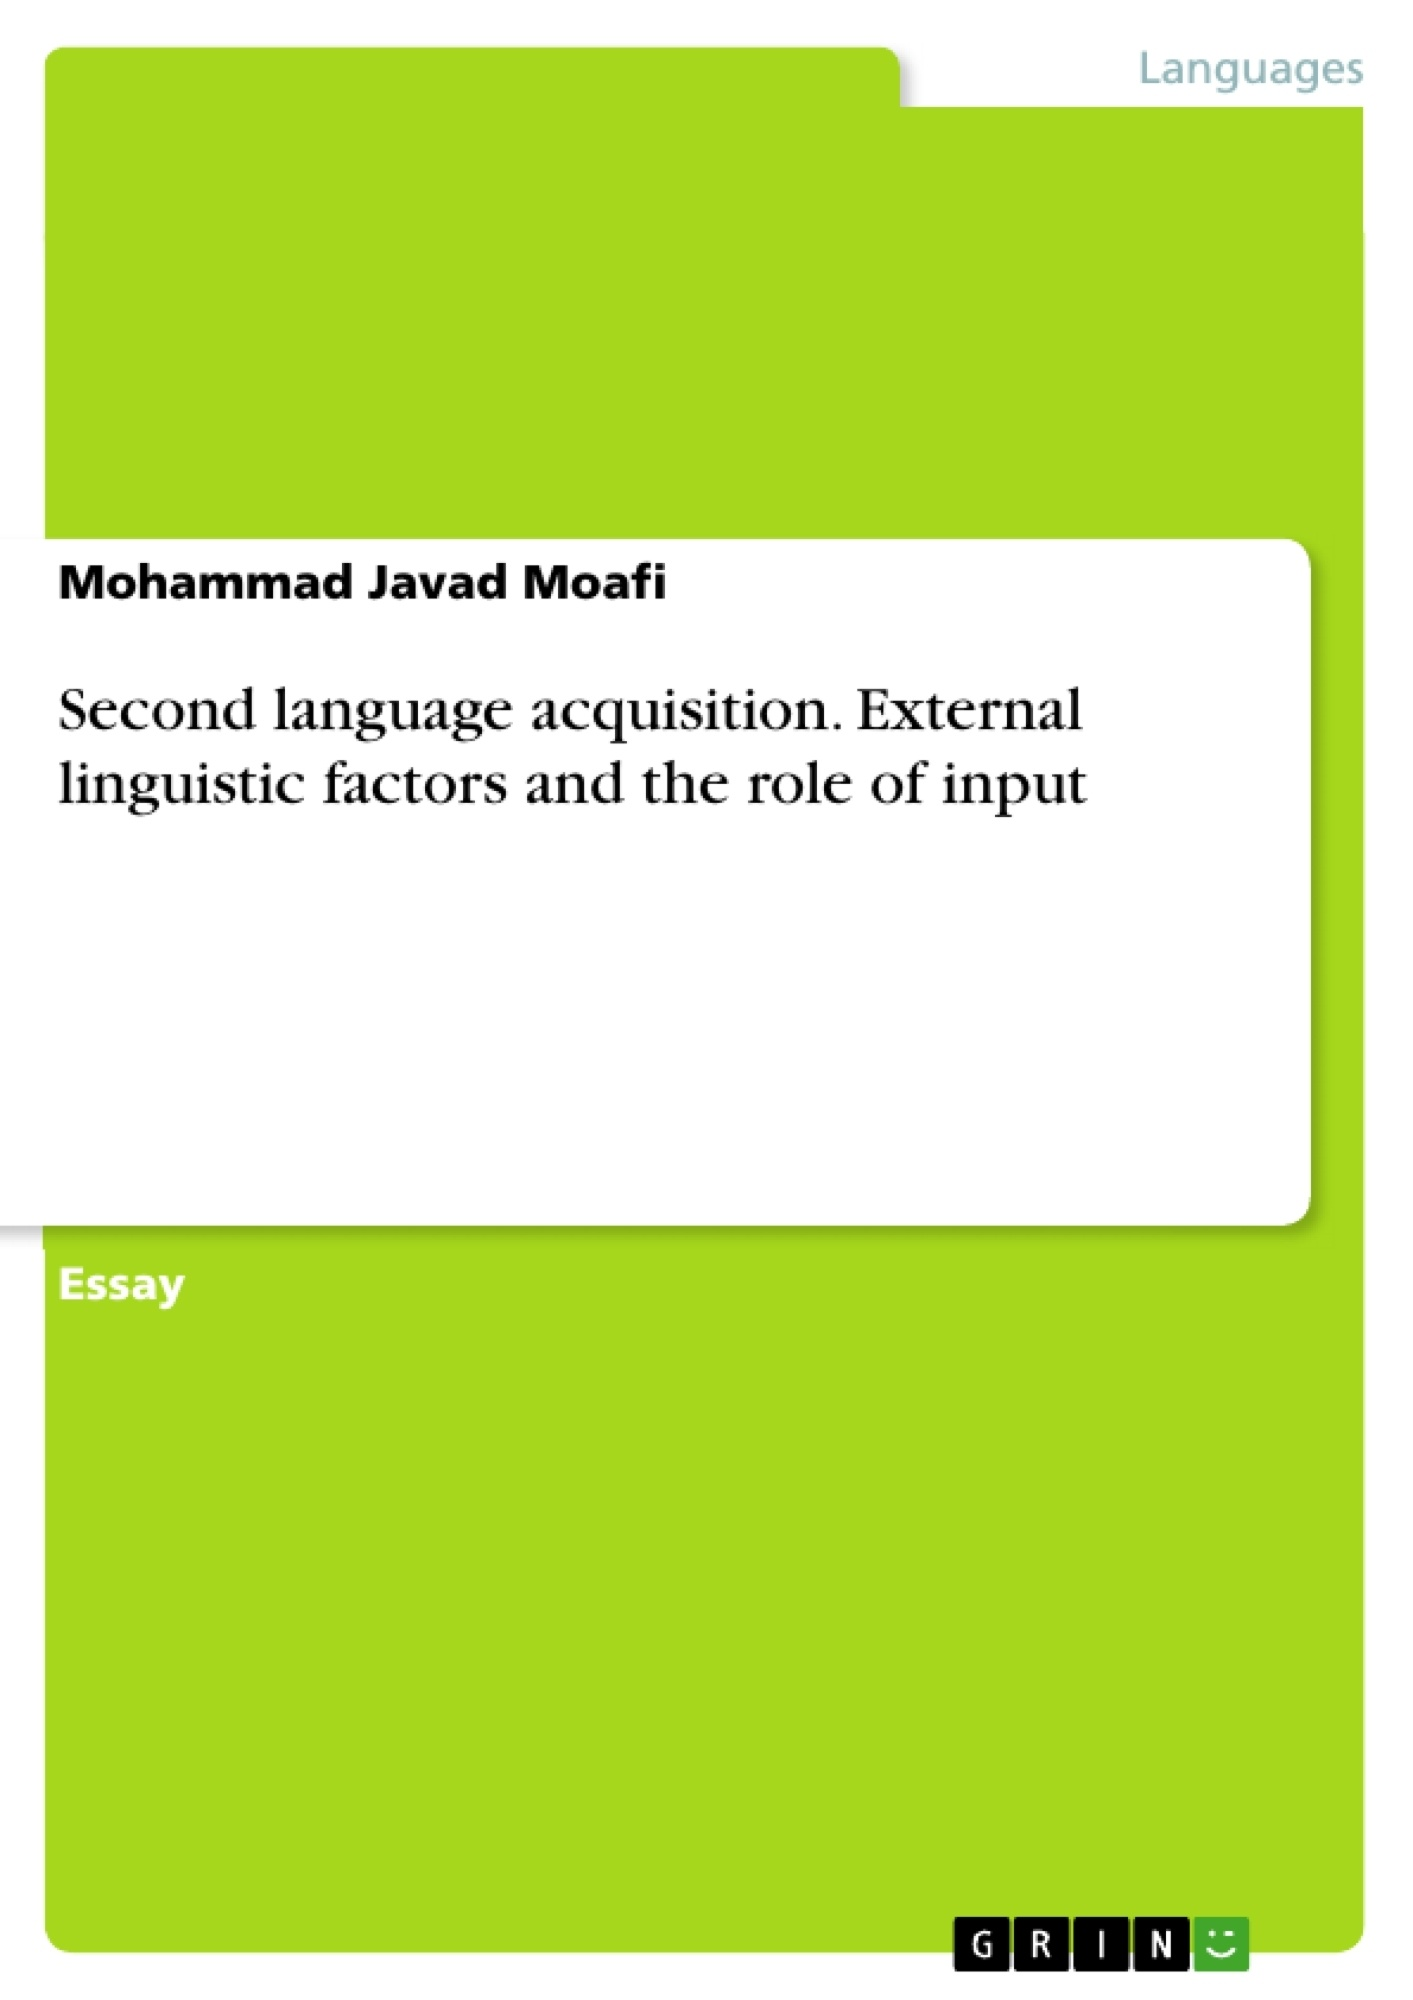 Title: Second language acquisition. External linguistic factors and the role of input